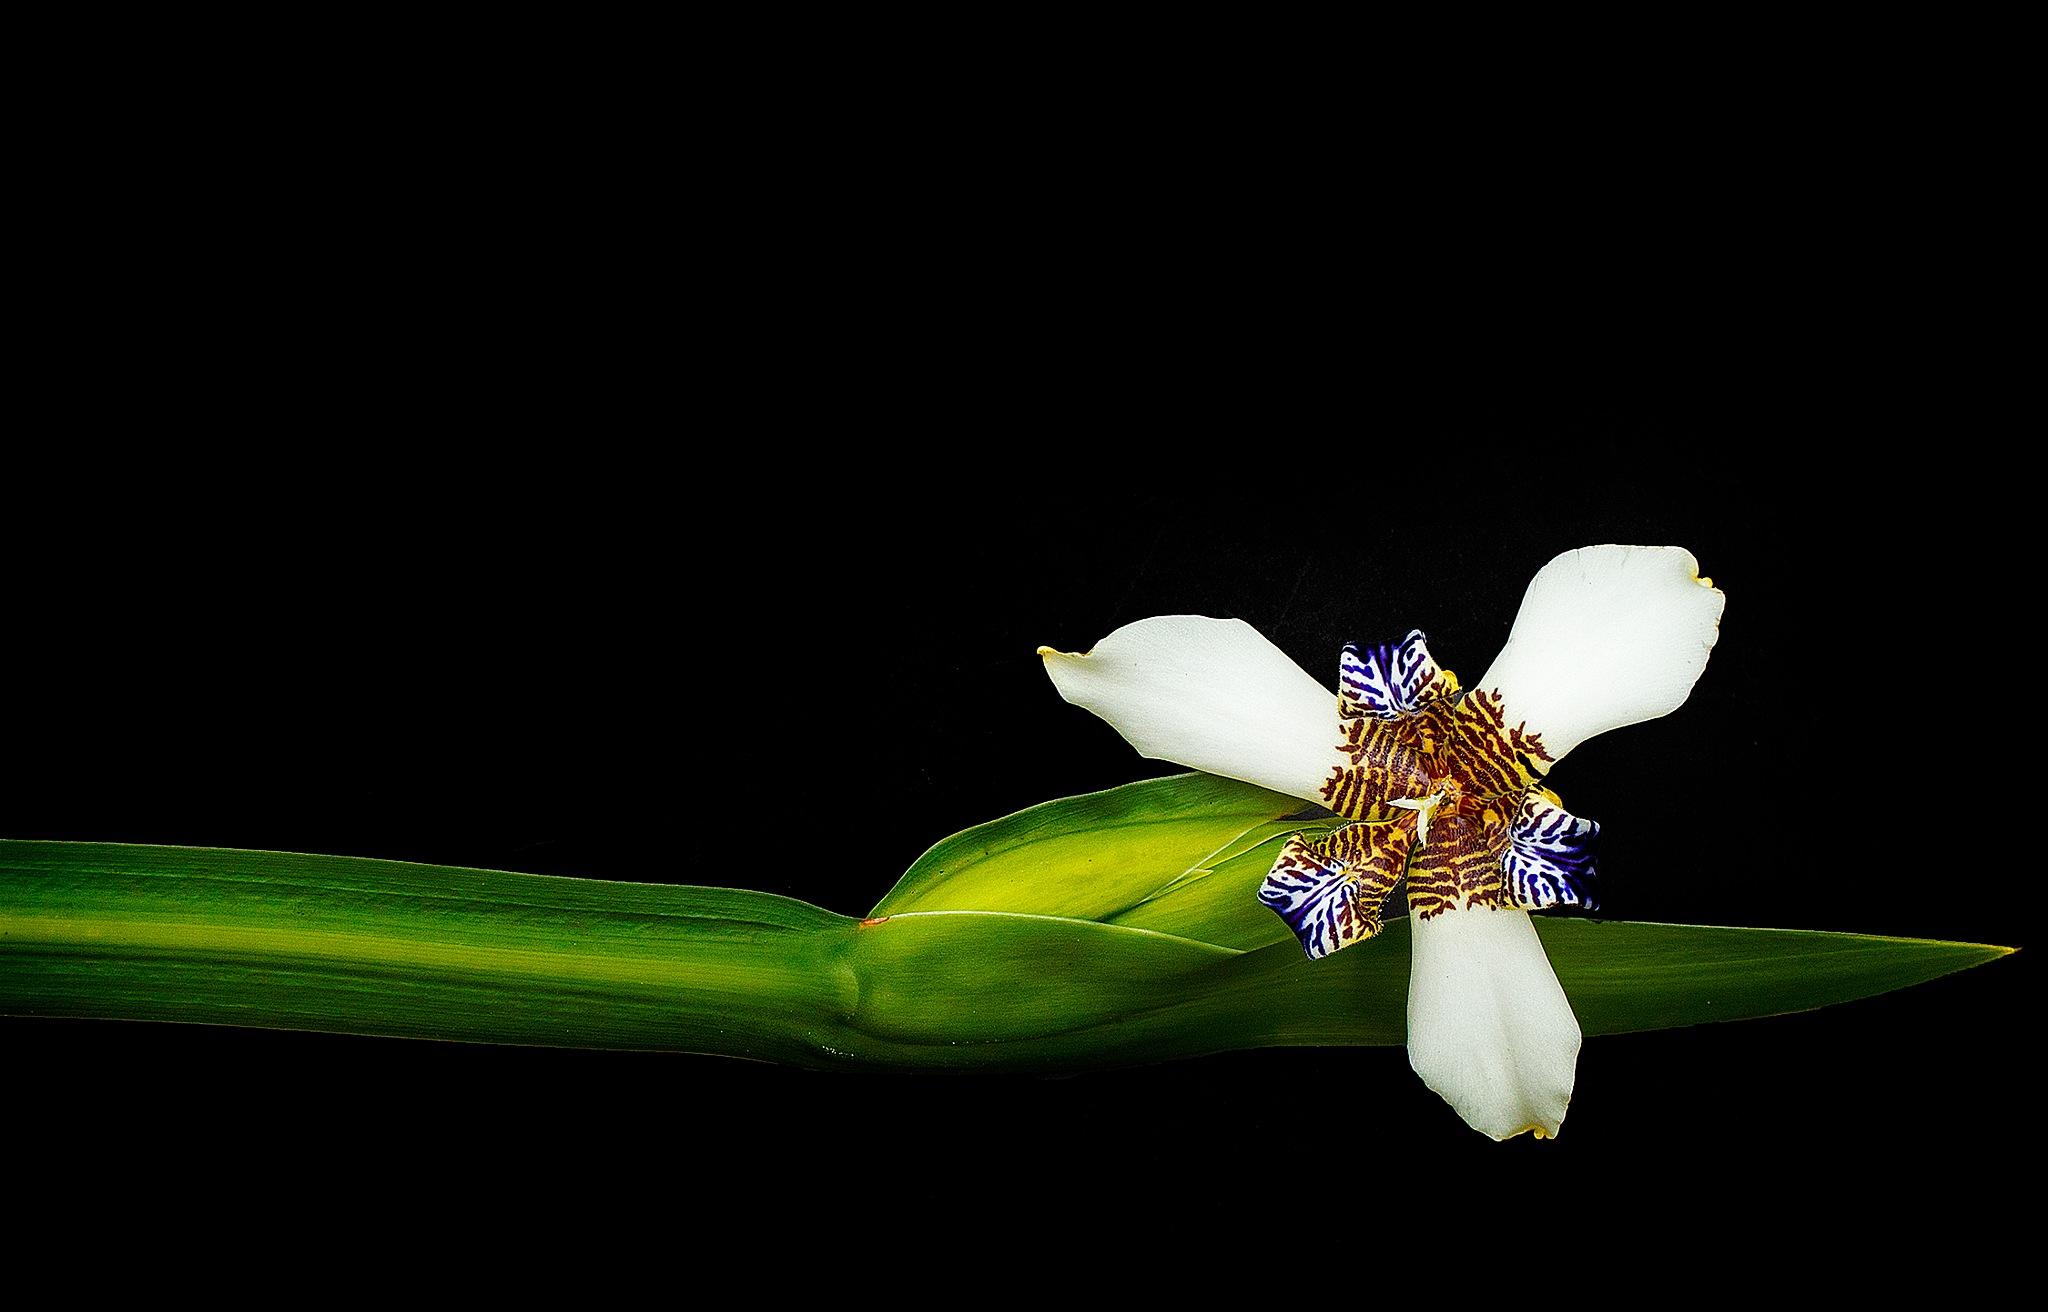 Iris by Luiz Caju